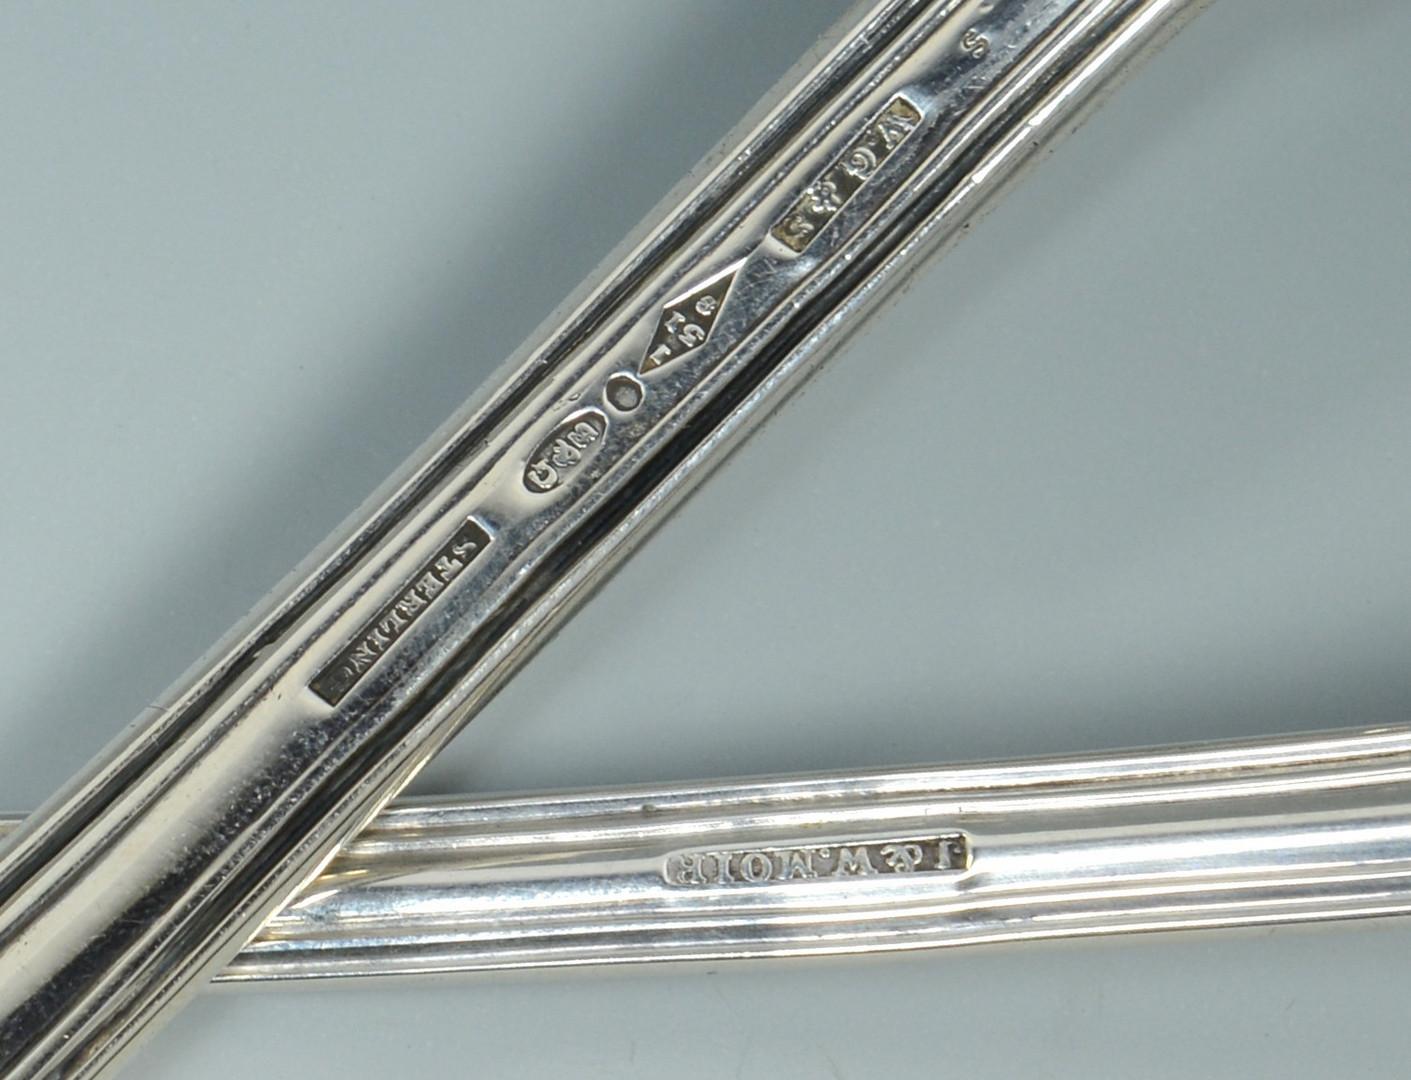 Lot 789: NY Silver spoons and ladles, 9 pcs